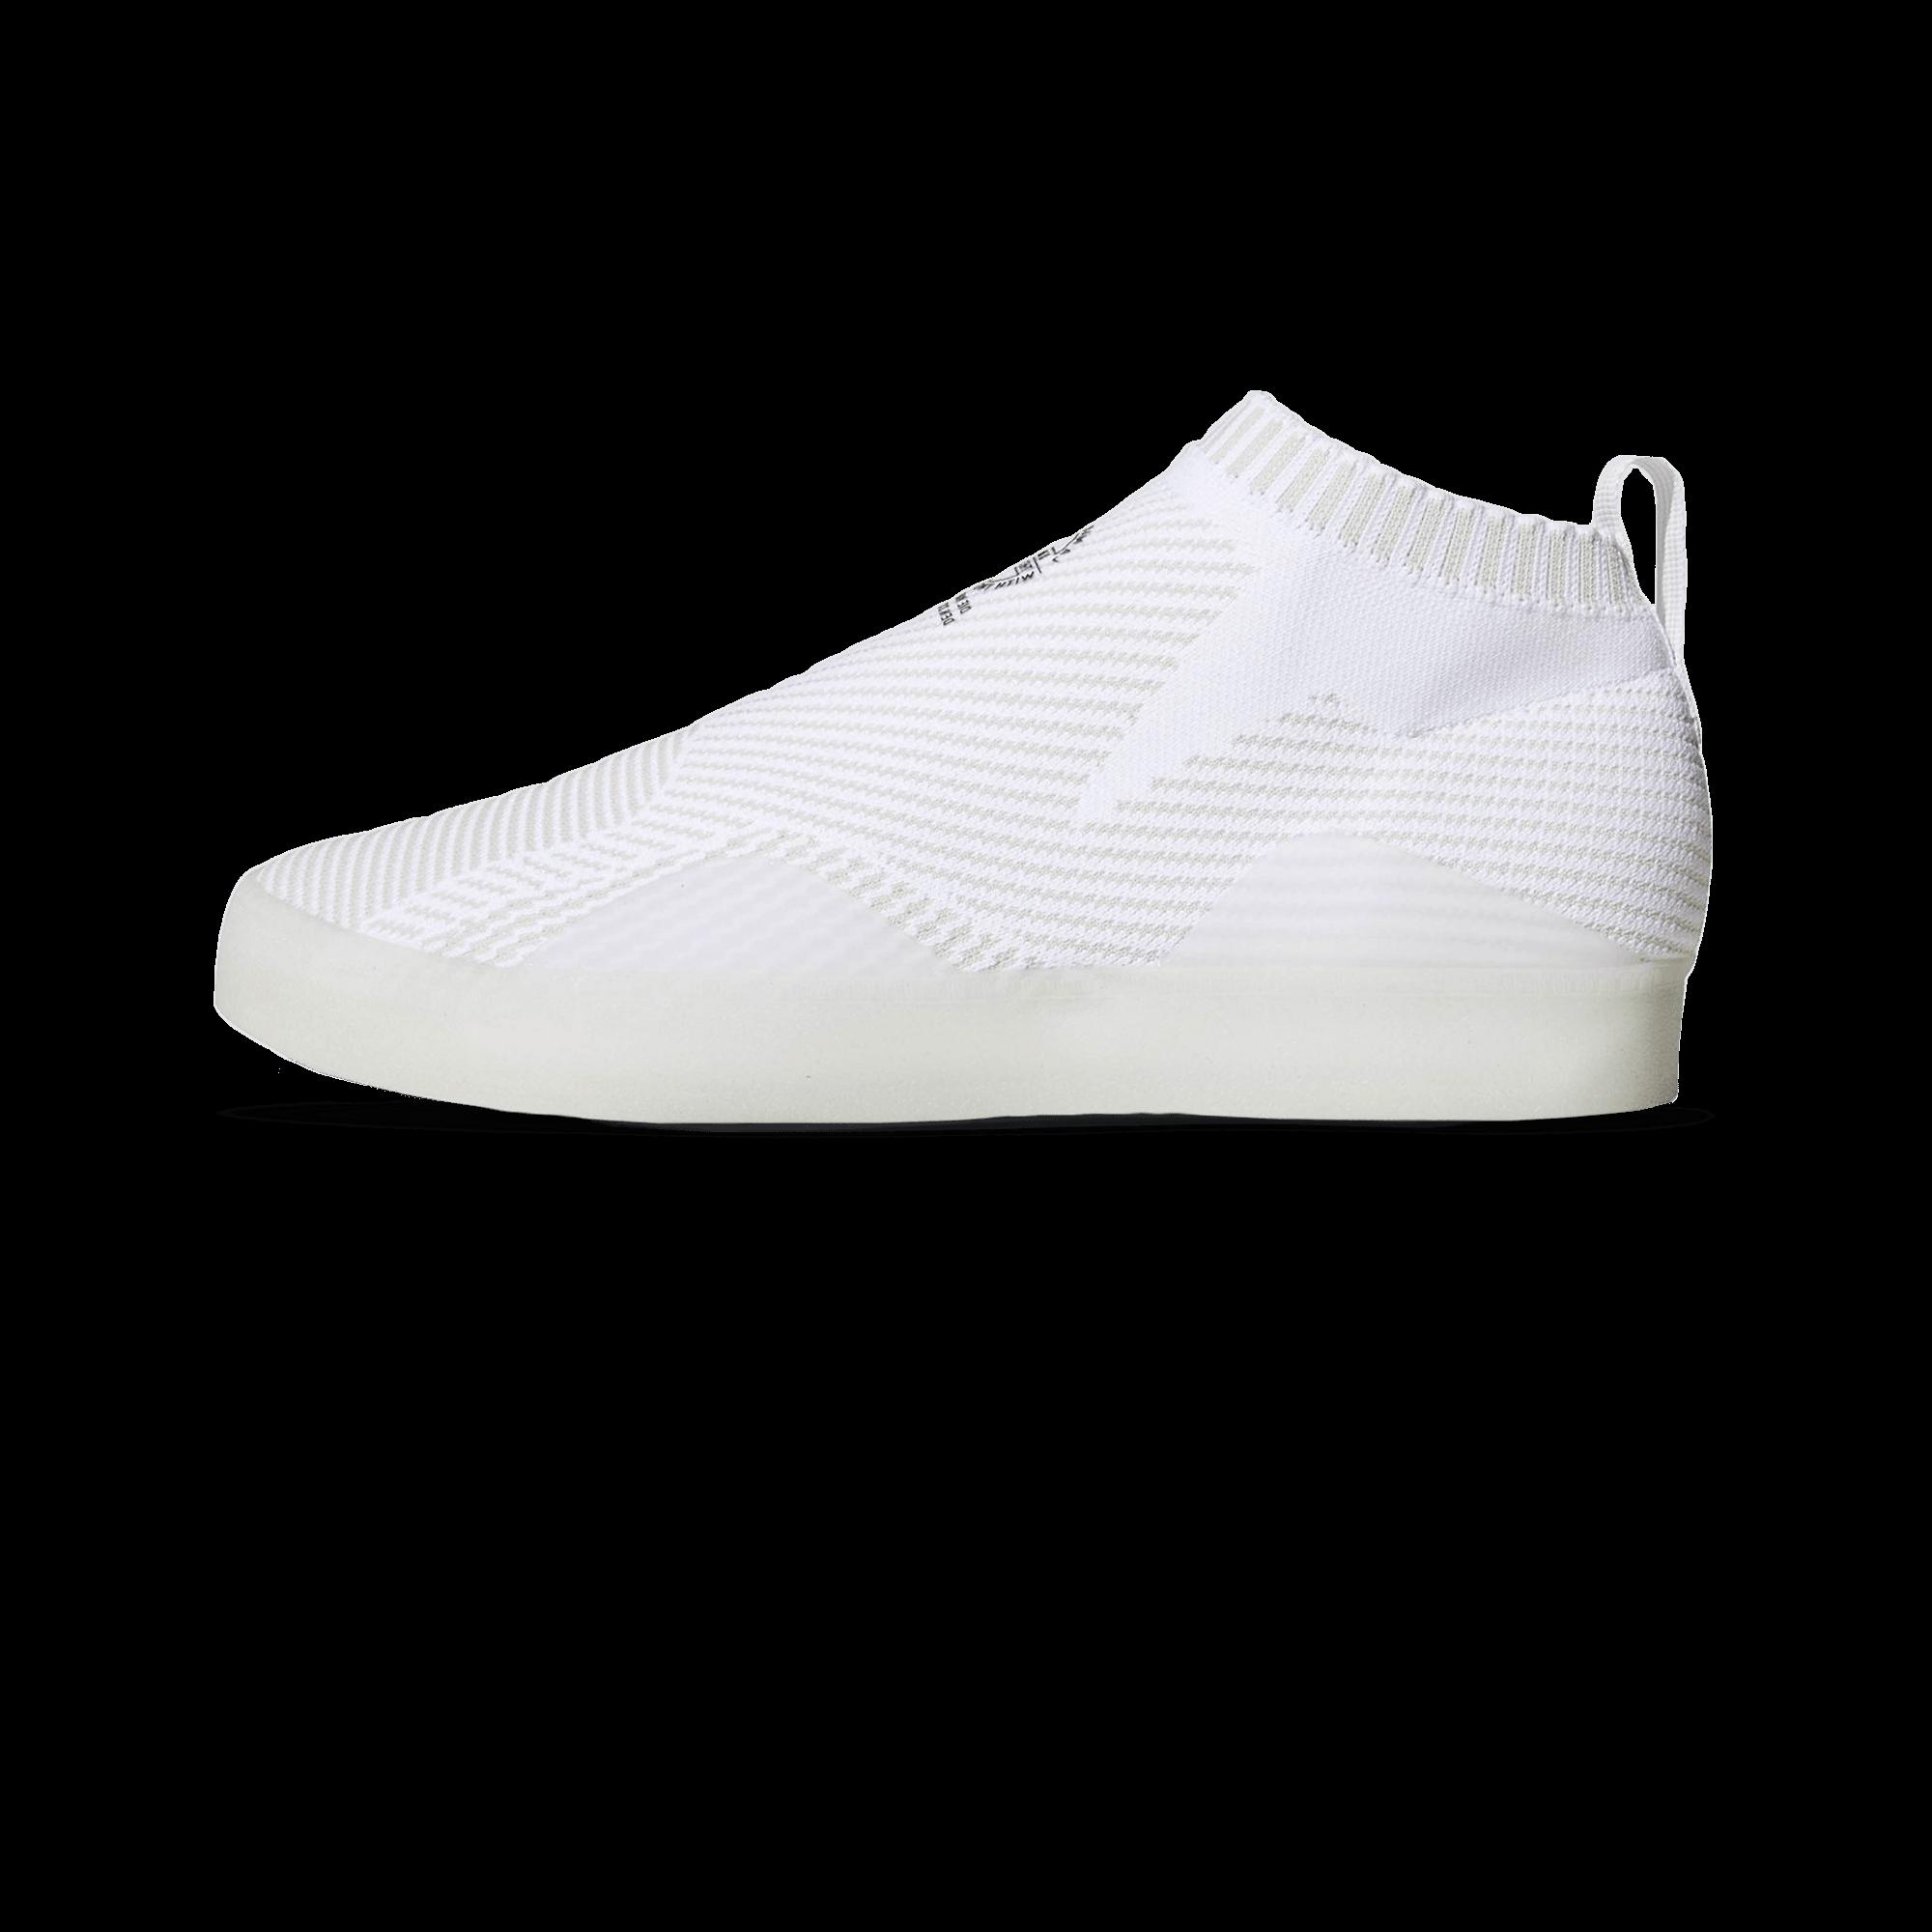 3ST.002 PK flat white